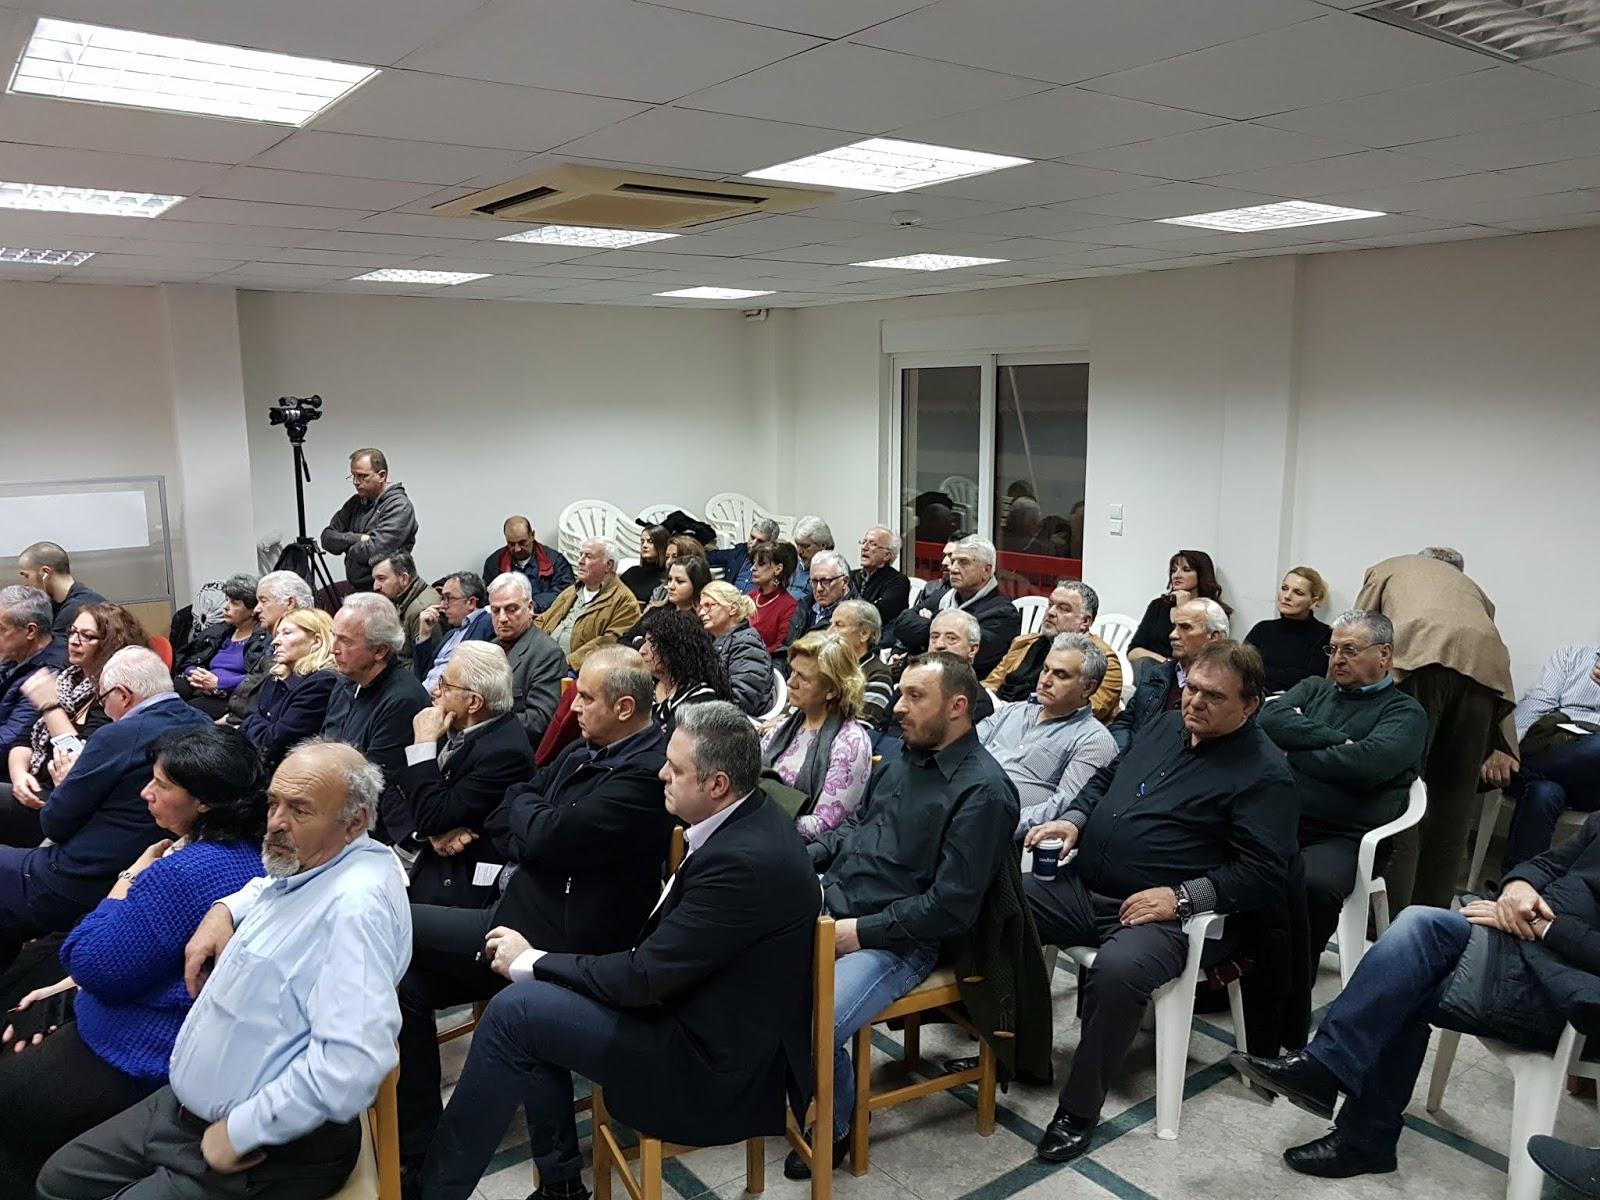 877bce6f52e Δήμος Παλλήνης: Έργα με ταυτότητα, οδό και αριθμό